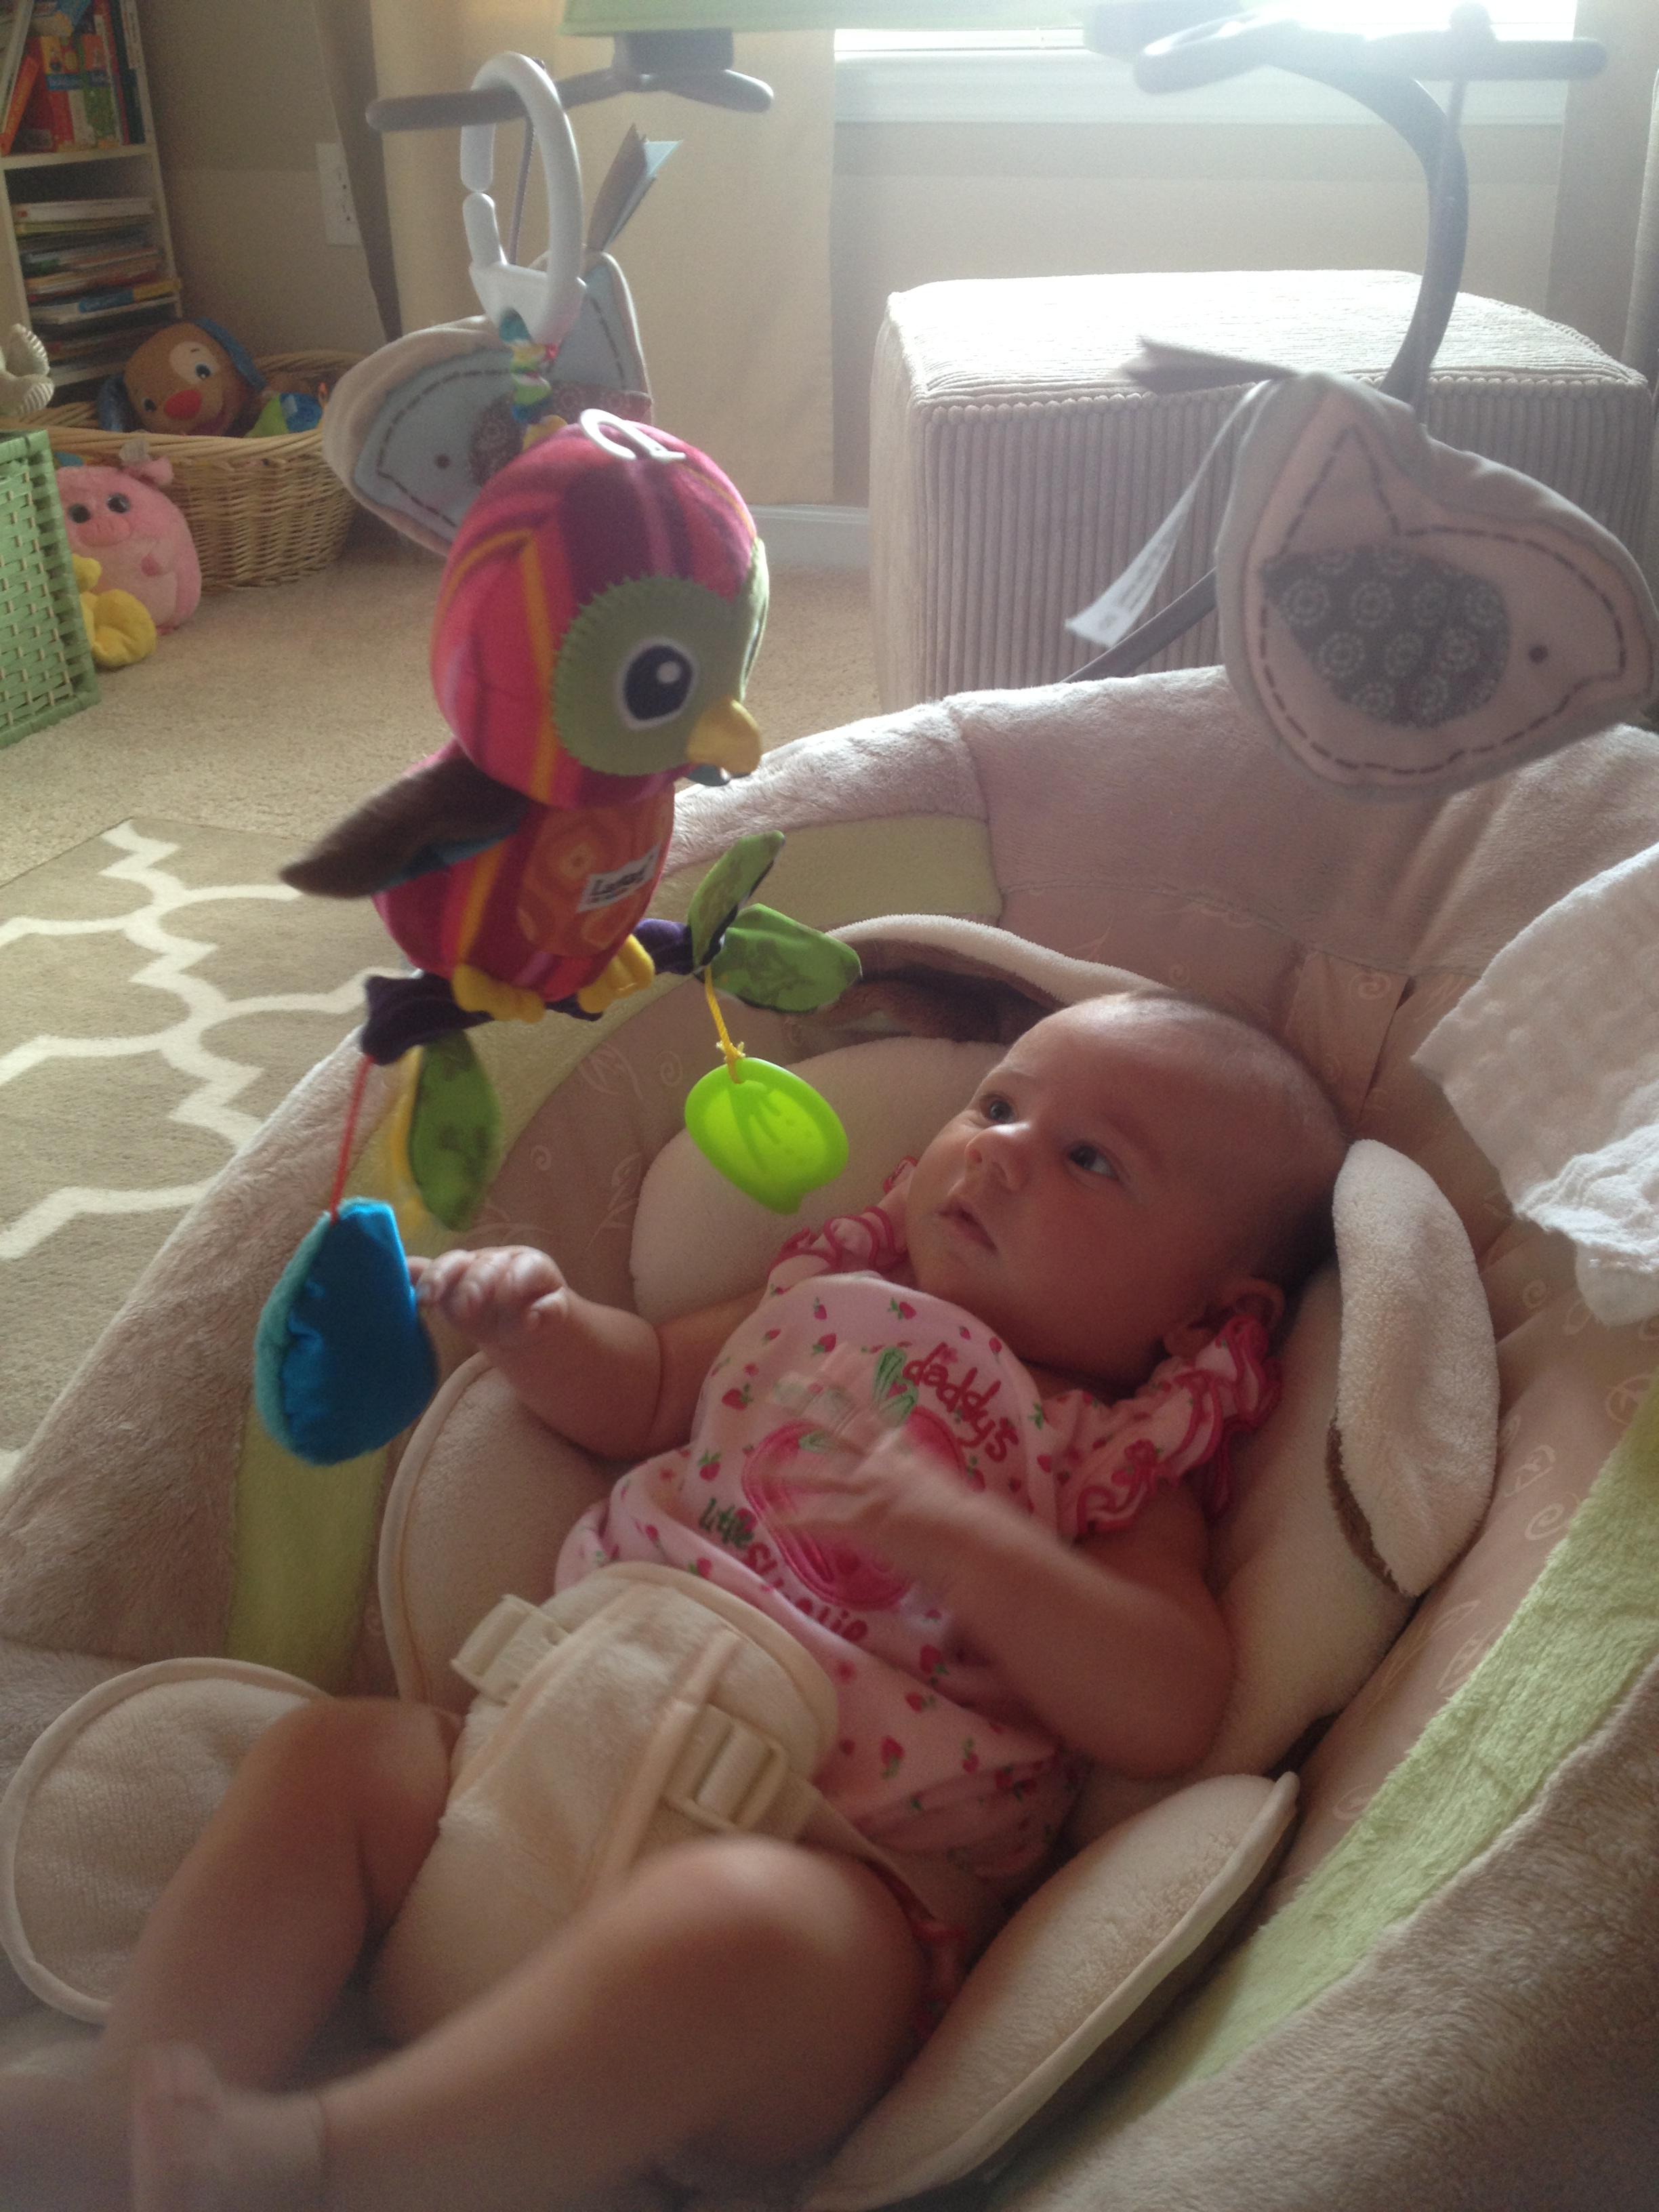 Charlotte eyeing her owl toy suspiciously